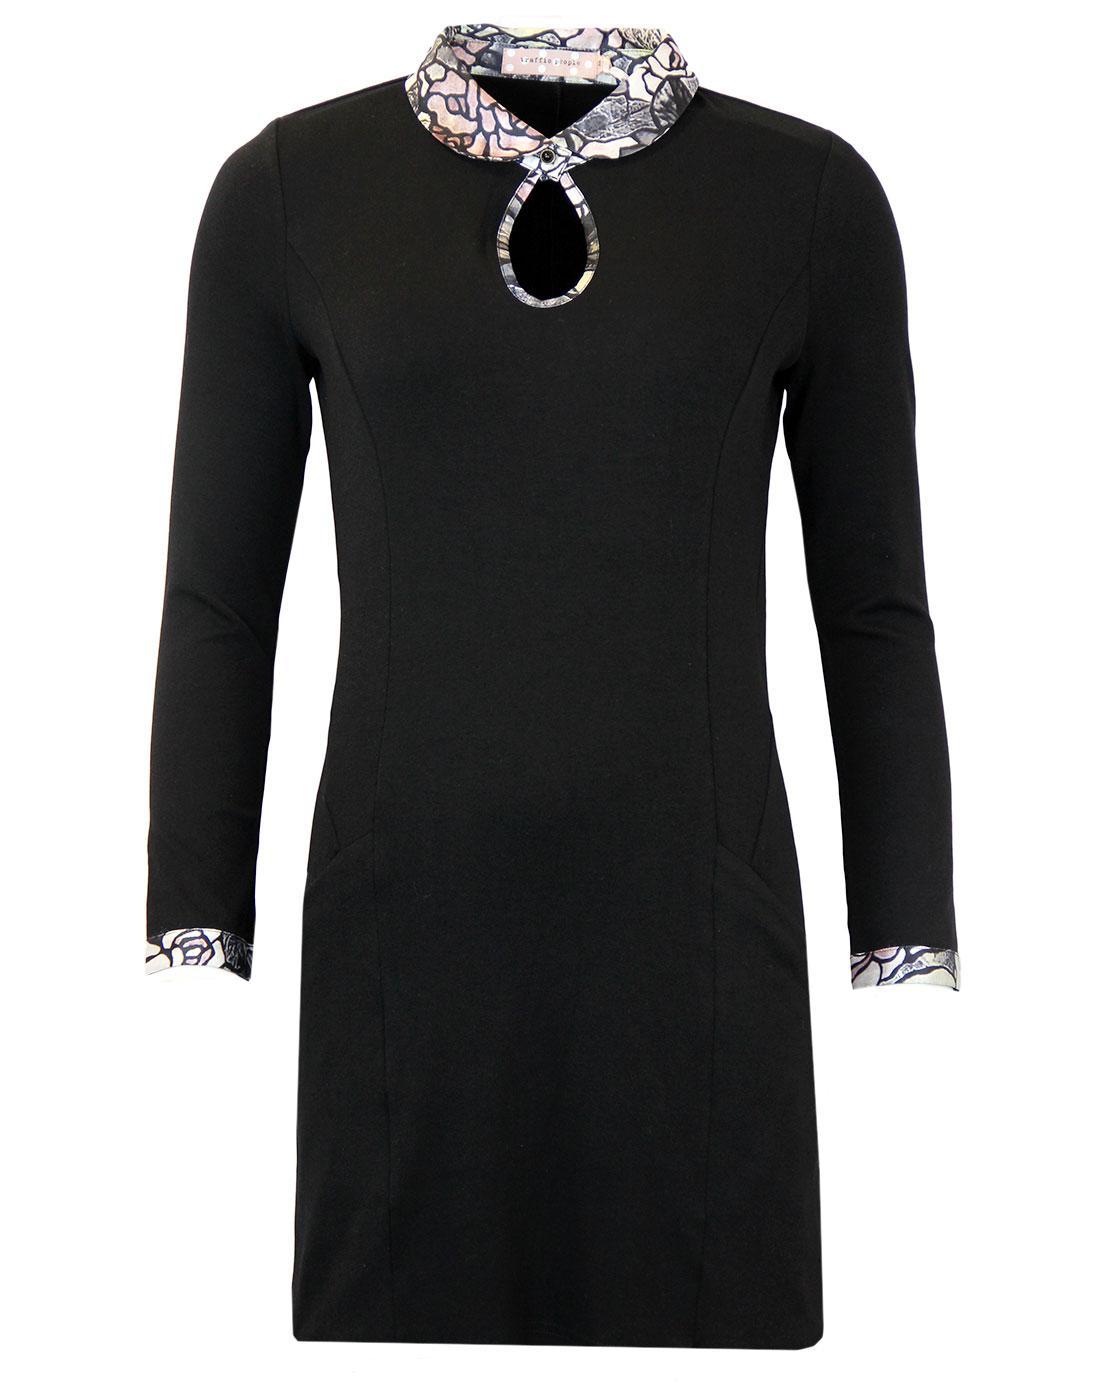 Marianna TRAFFIC PEOPLE Retro Penny Collar Dress